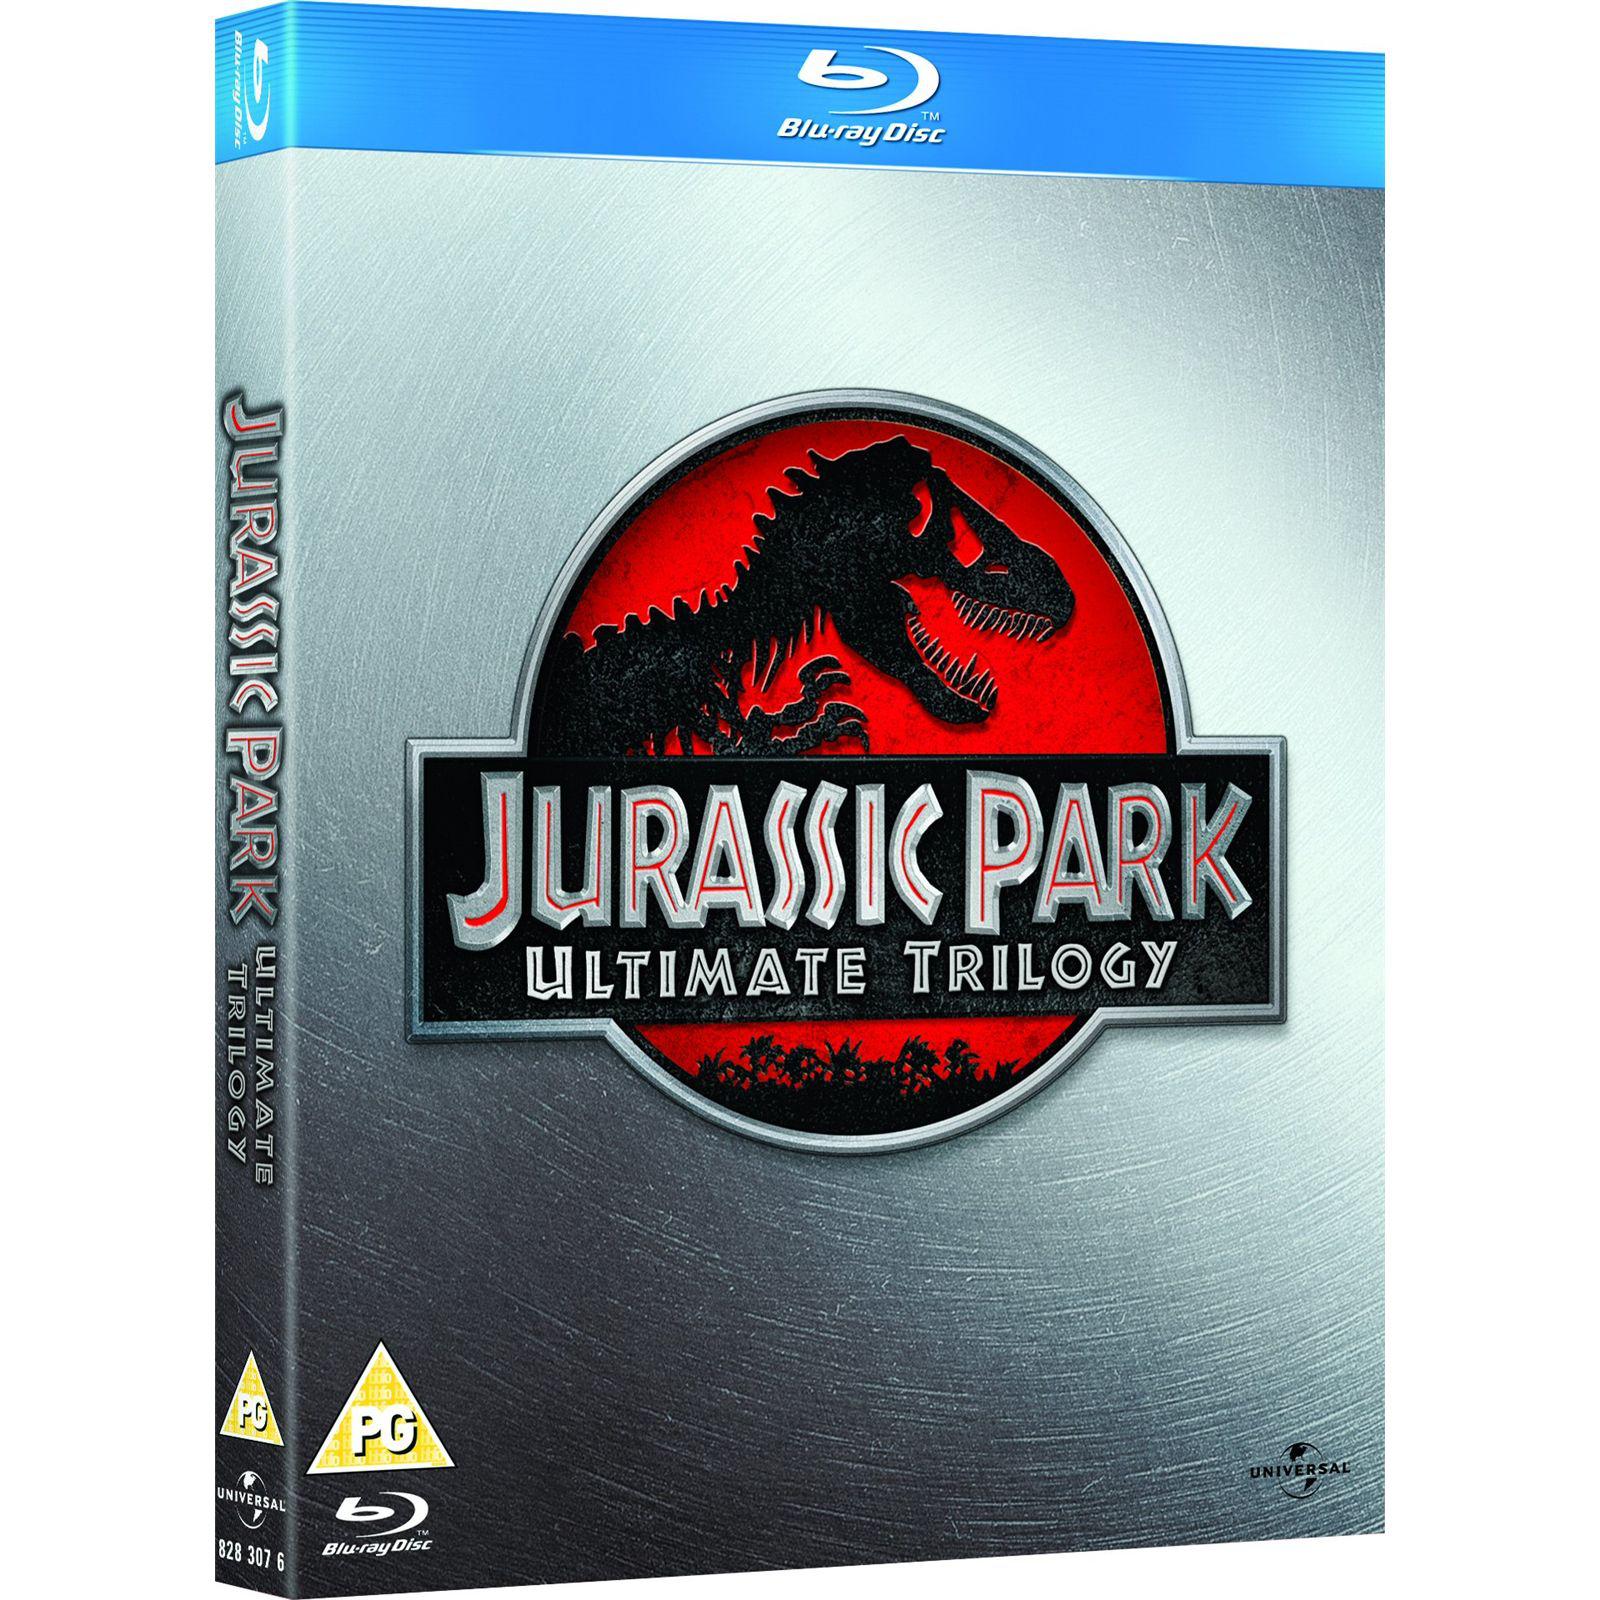 Coffret Blu-ray Jurassic Park Trilogie